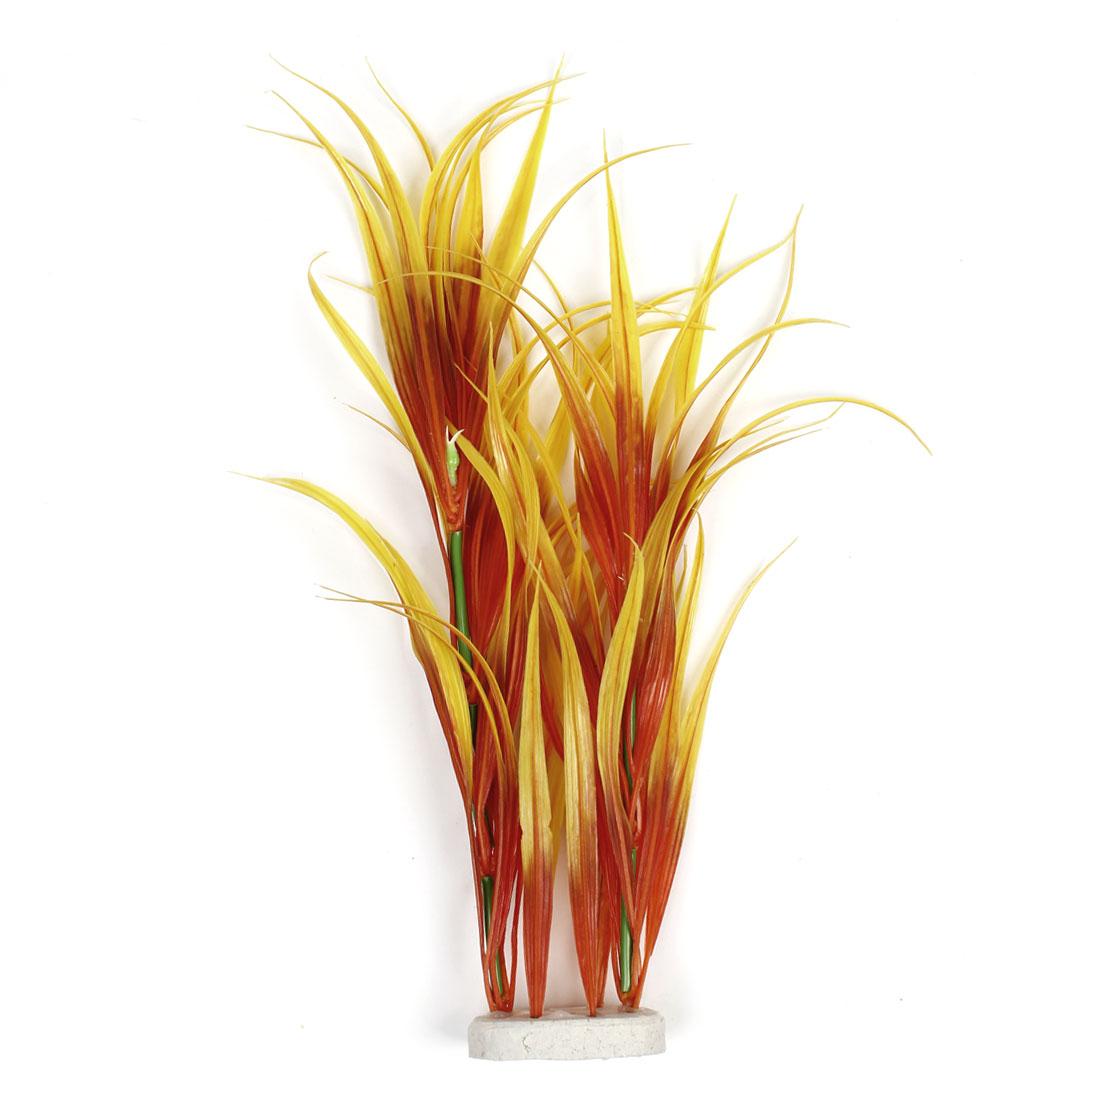 "Fish Tank Aquarium Yellow Red Emulational Plastic Vivid Grass 42cm 16.5"" Height"